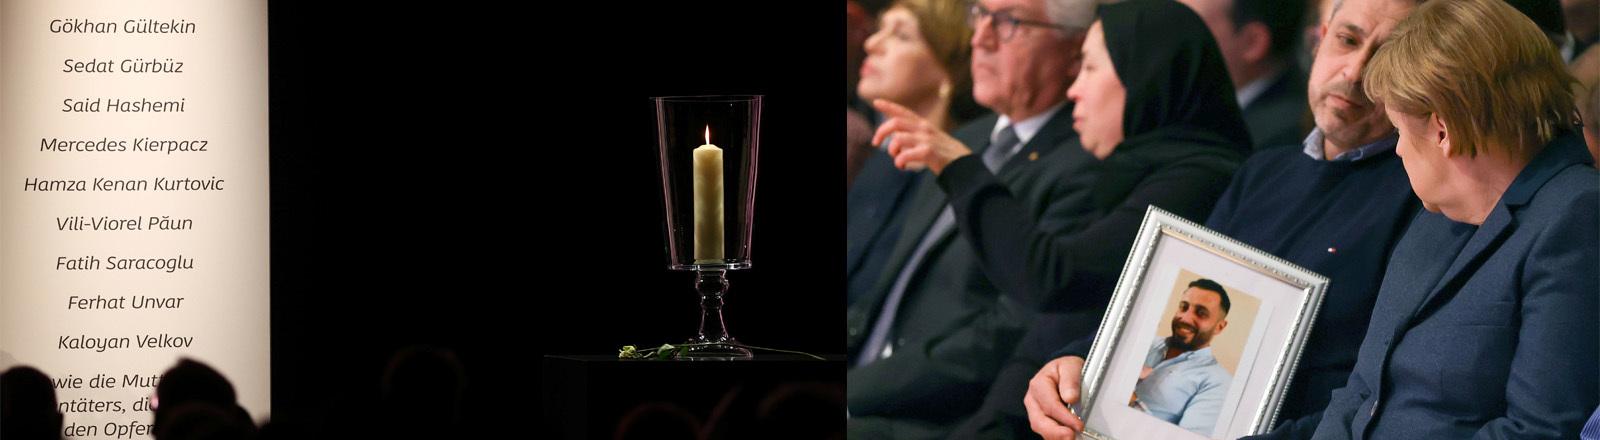 Trauerfeier in Hanau